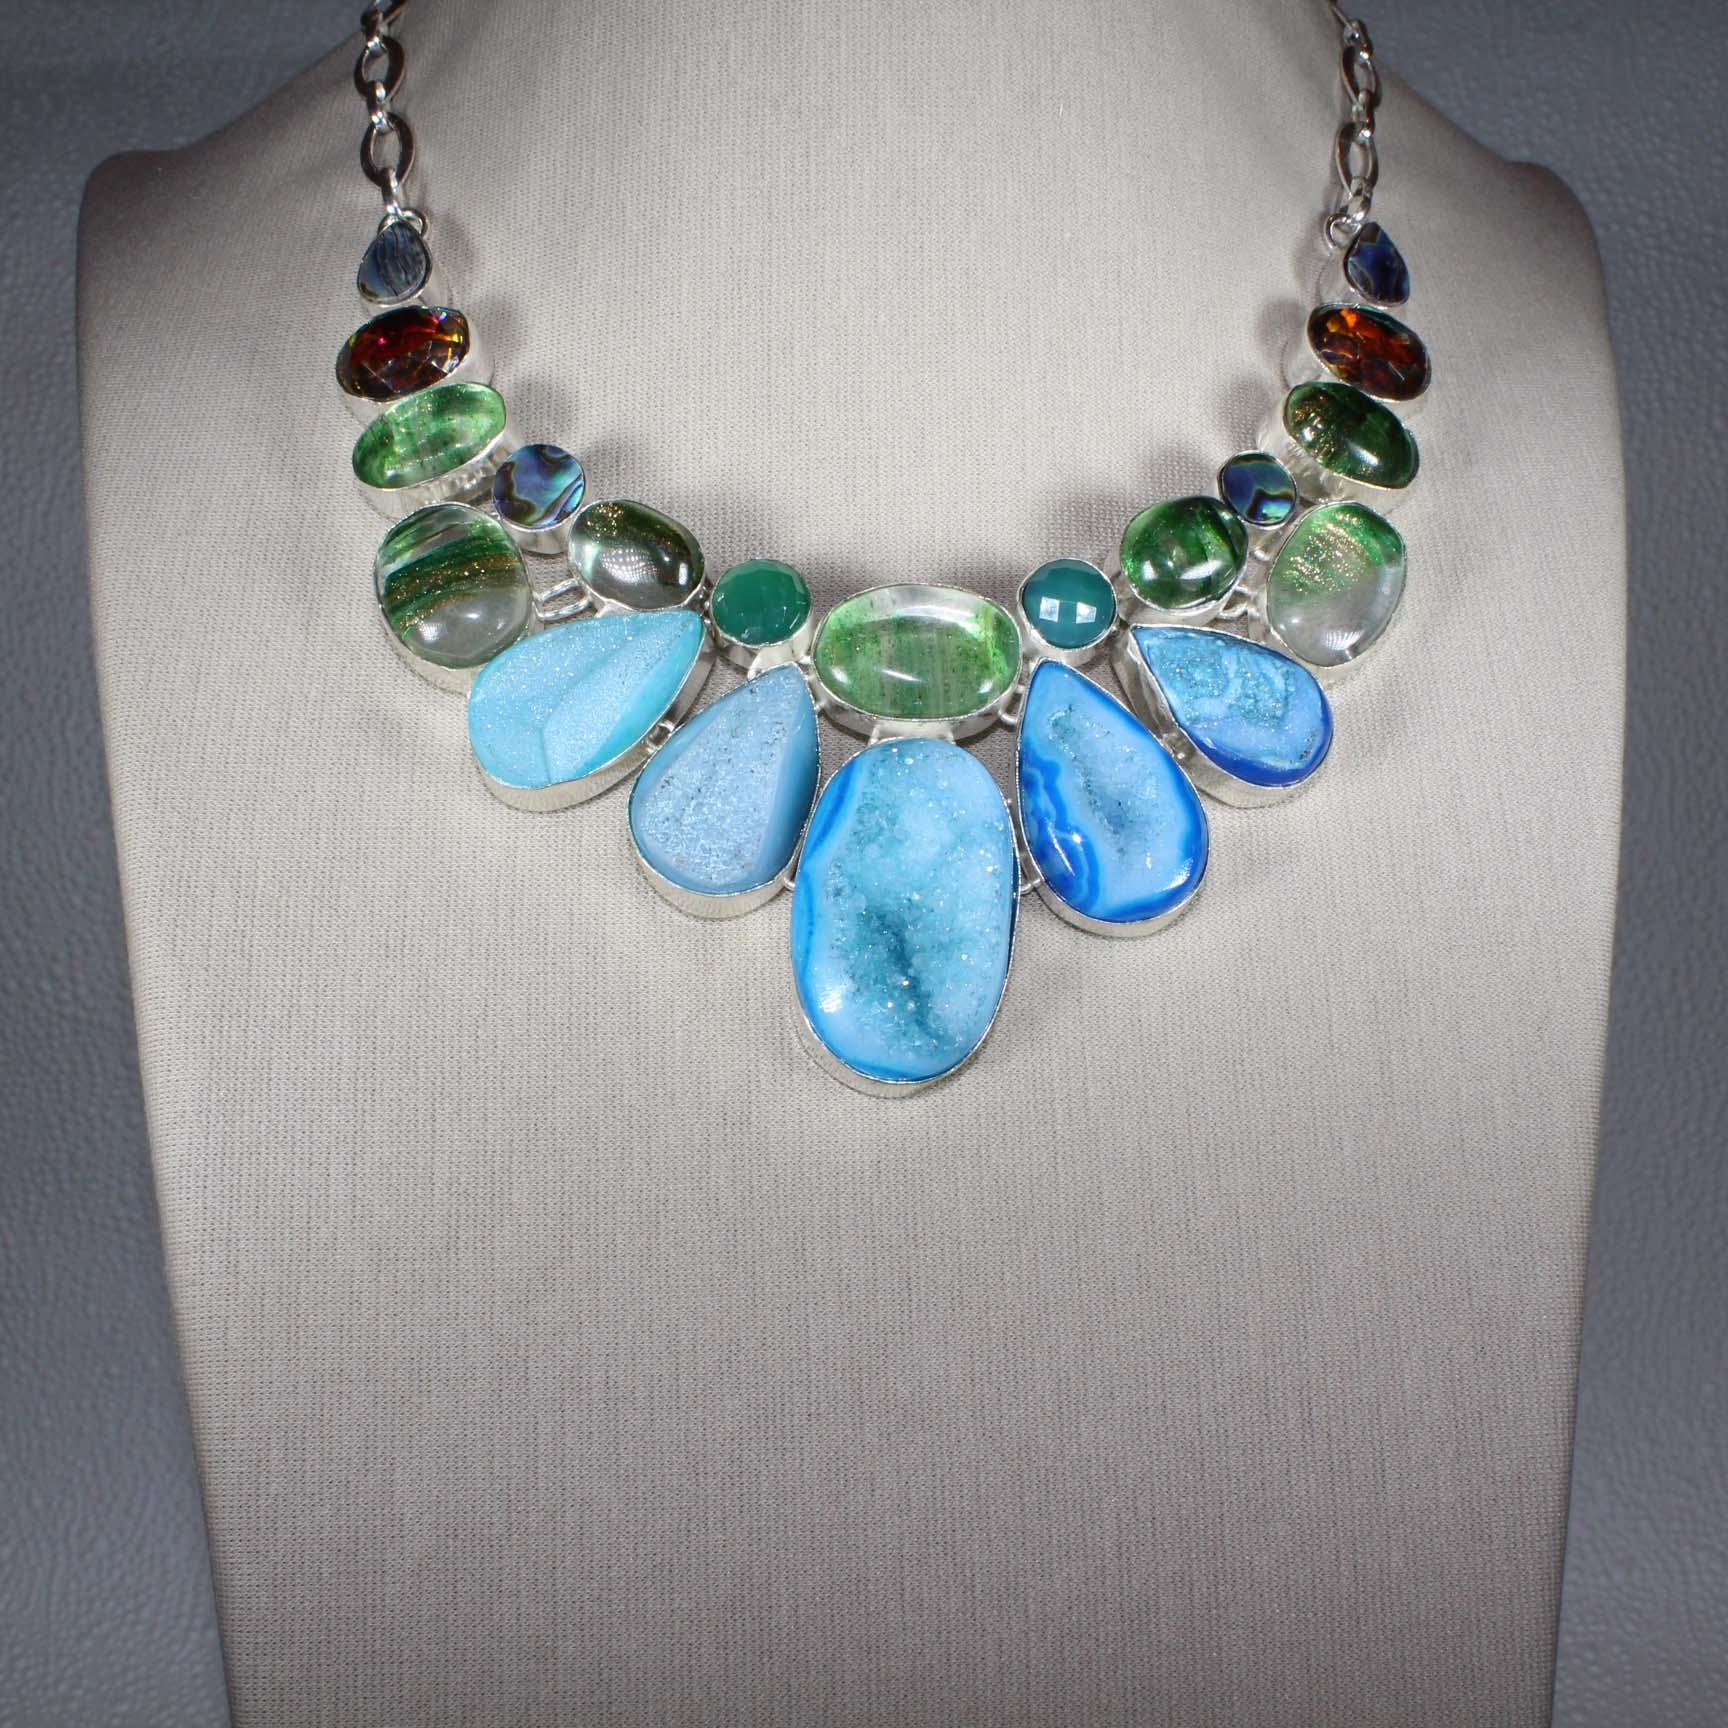 Ожерелье из голубой друзы мистик